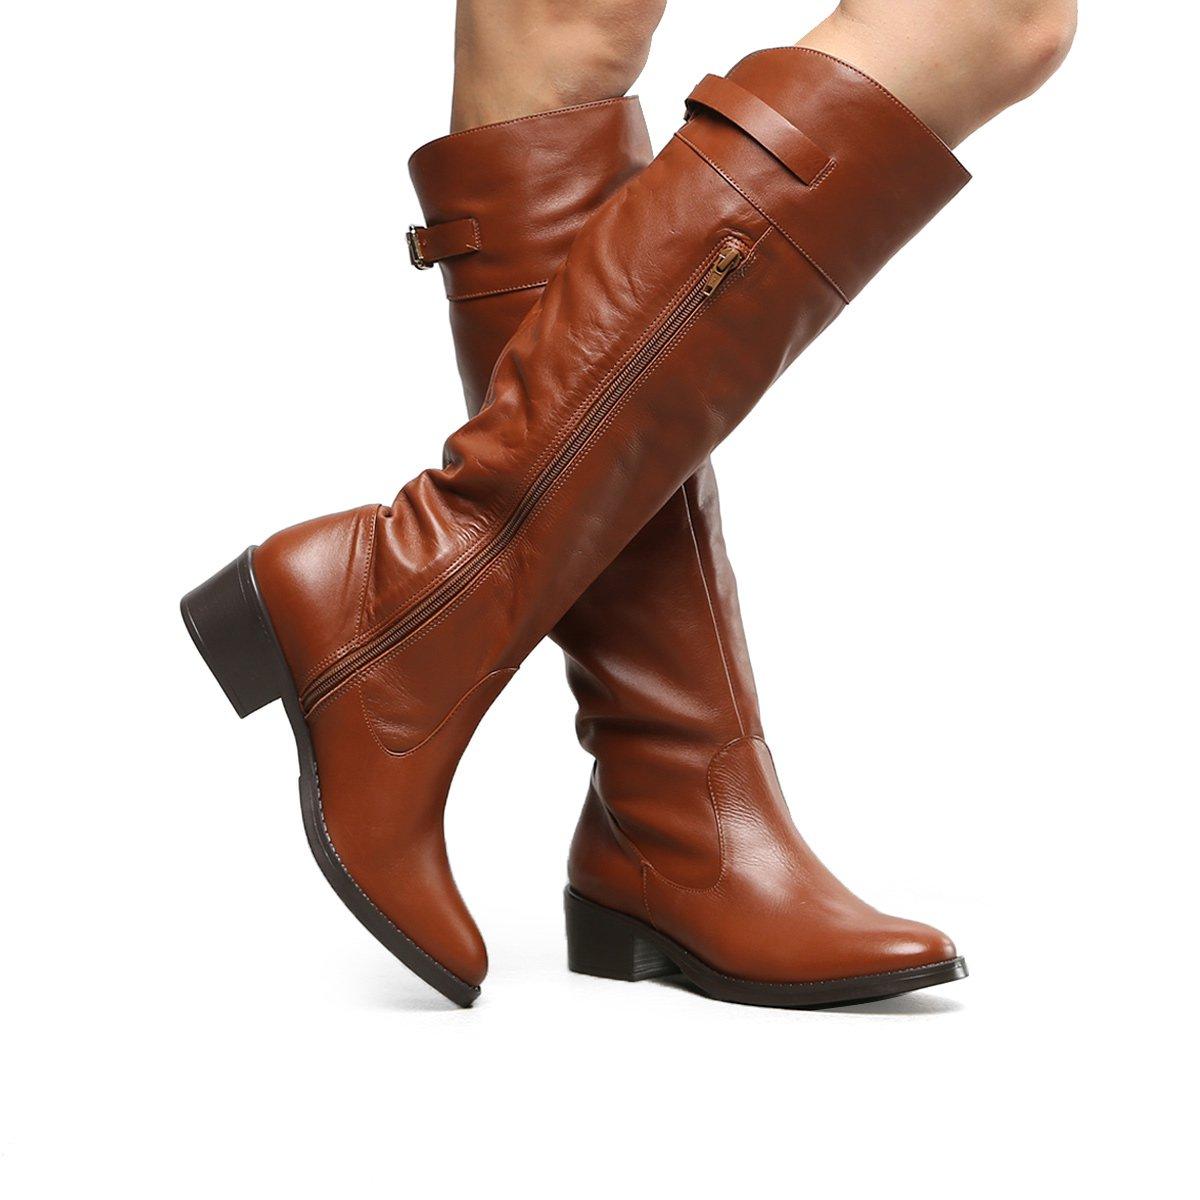 Marrom Couro Bota Flat Montaria Bota Feminina Couro Shoestock UTw70q